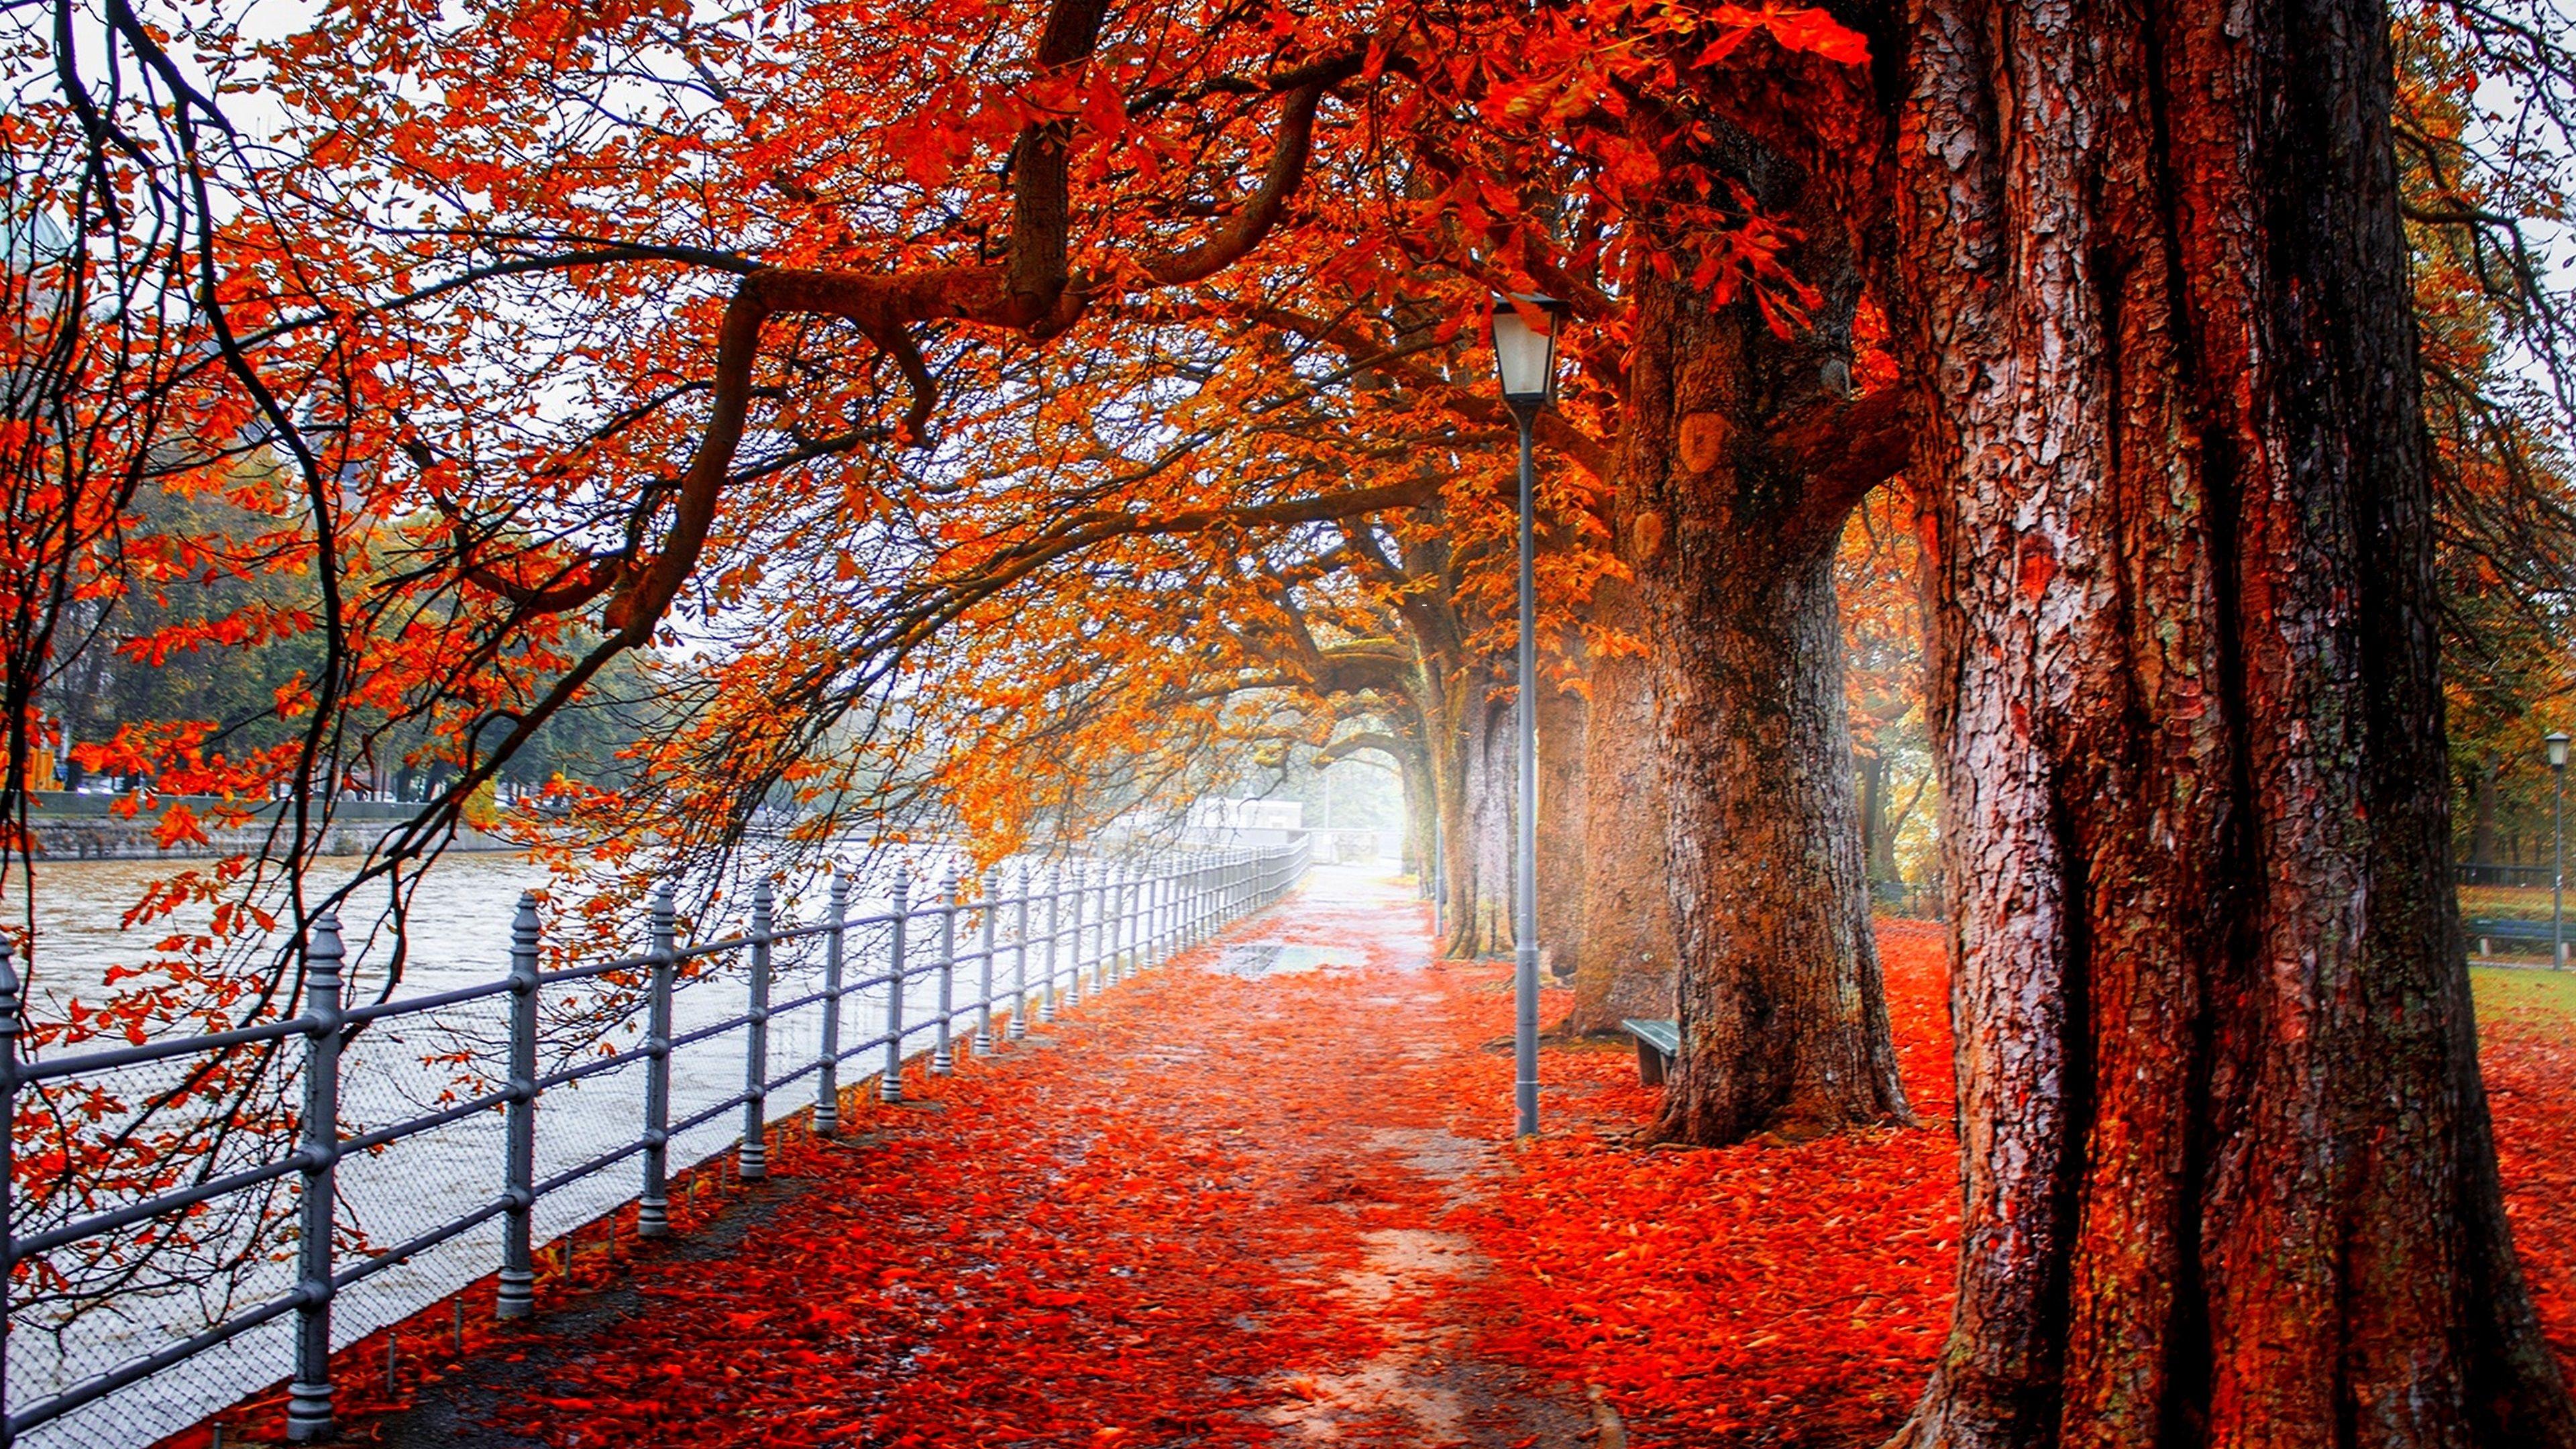 Pin By Nicolas Rivero On Art Wallpapers Autumn Landscape Hd Nature Wallpapers Landscape Wallpaper